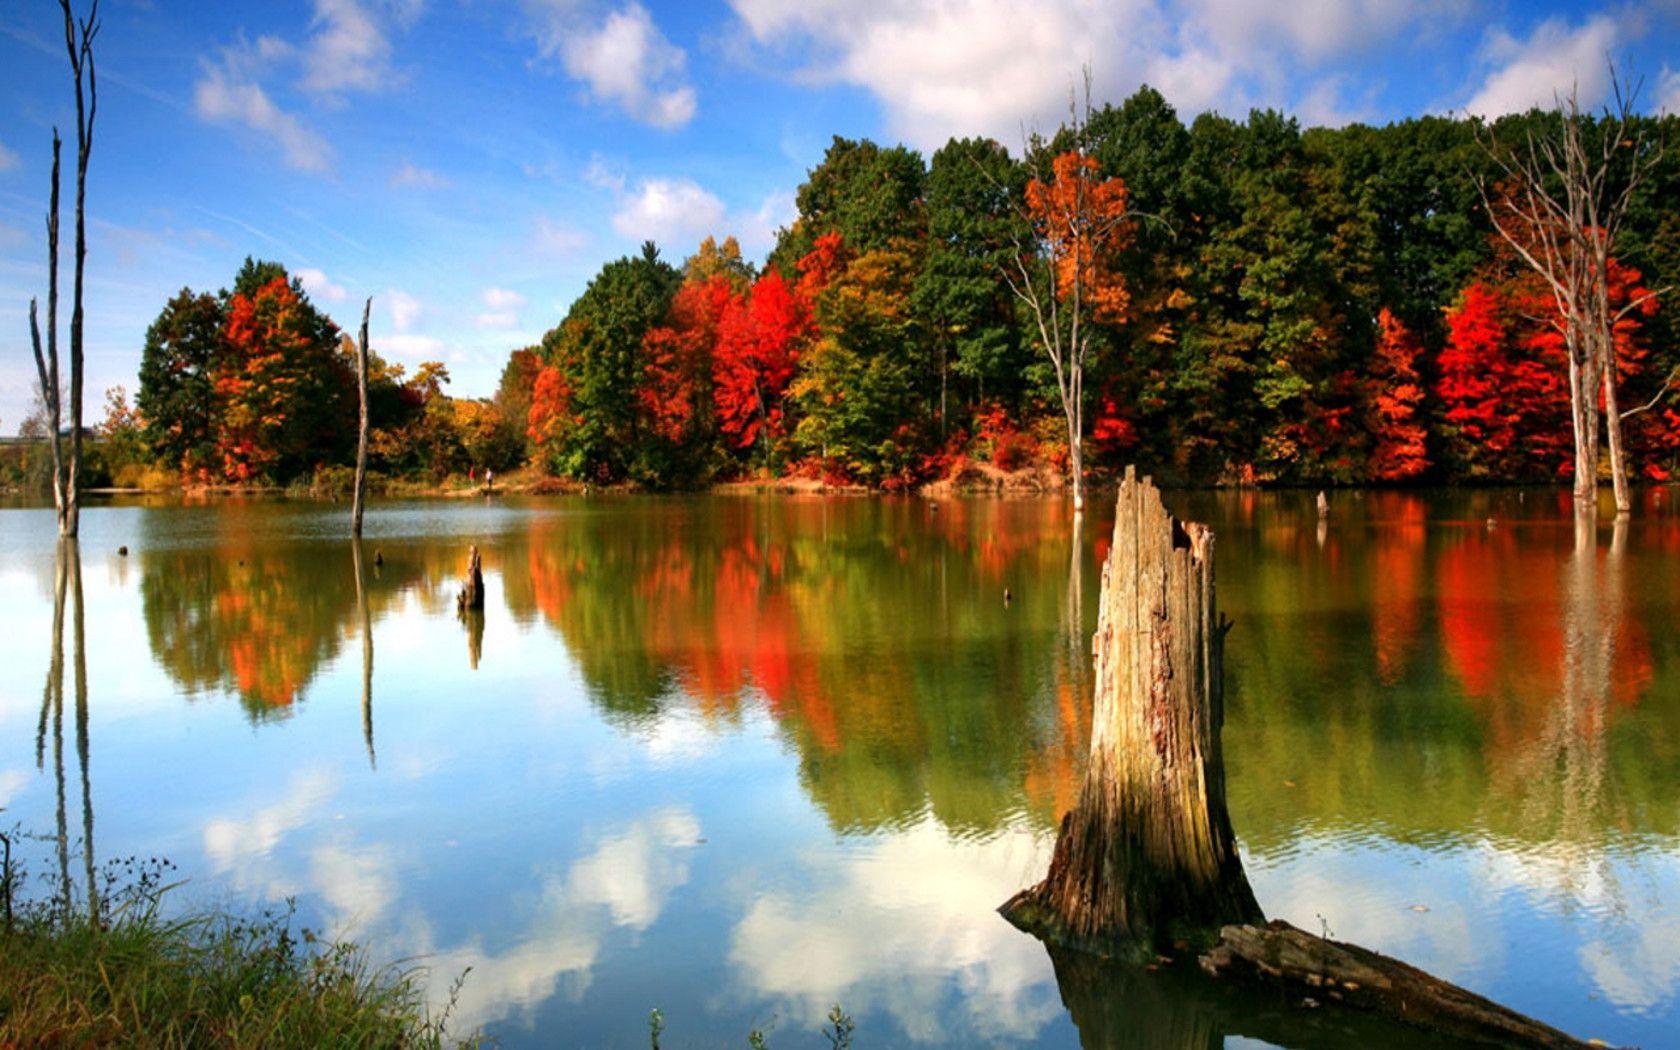 Free Fall Desktop Backgrounds Autumn Wallpaper Hd Free Screensavers And Wallpapers Screen Savers Wallpapers